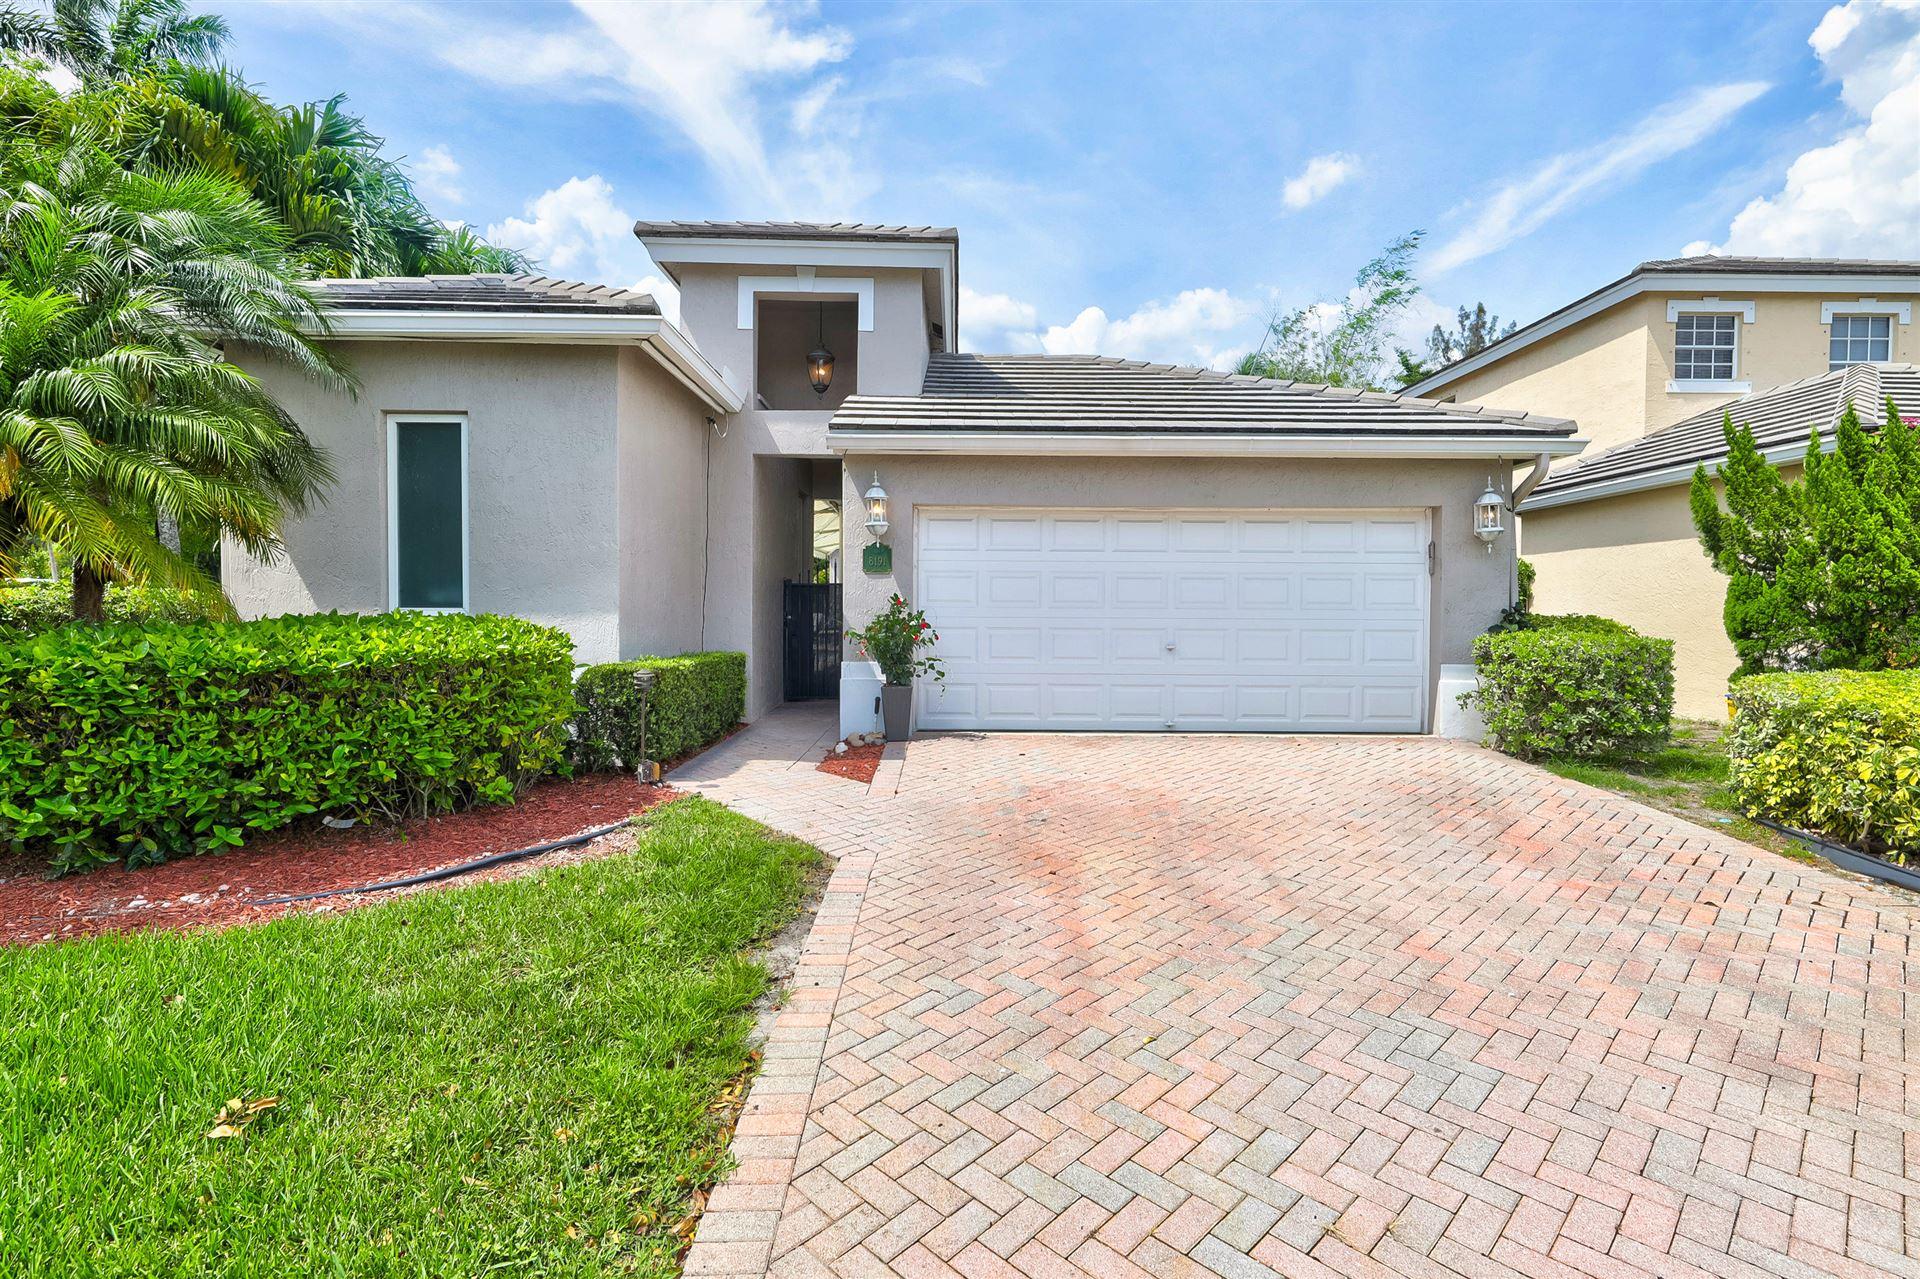 8191 Hampton Wood Drive, Boca Raton, FL 33433 - #: RX-10619465